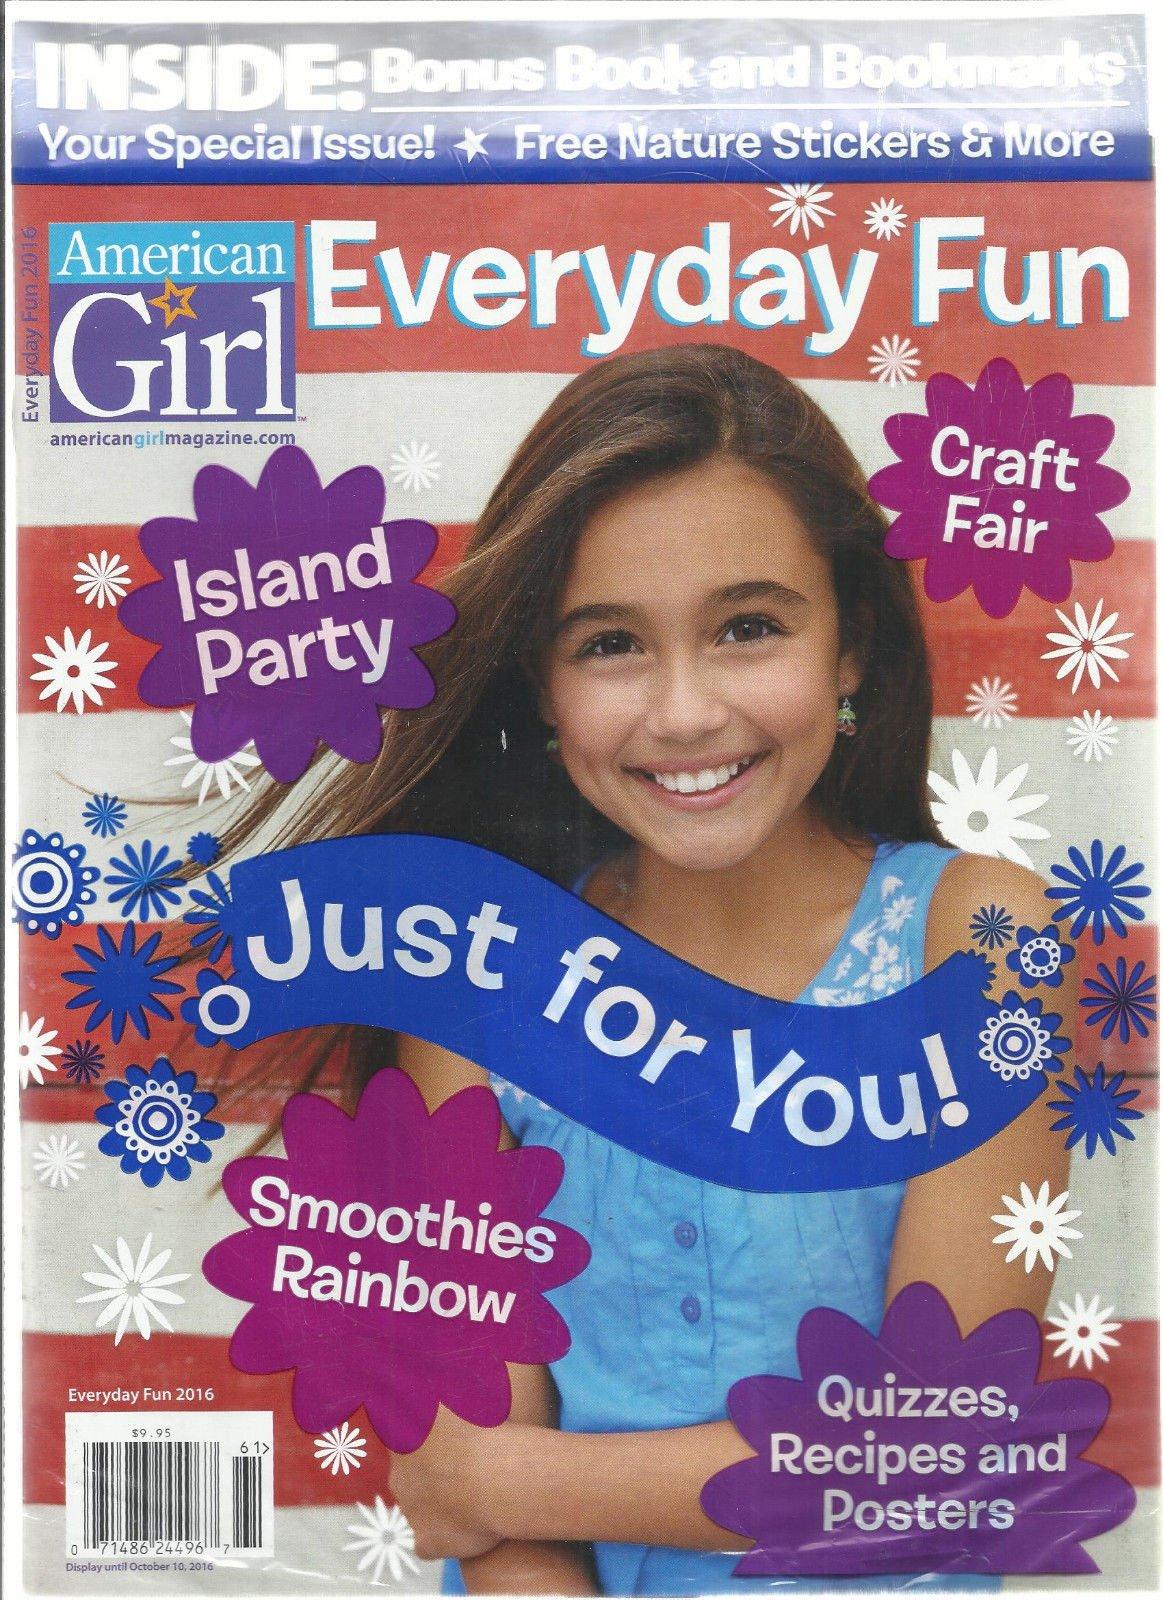 AMERICAN GIRL EVERYDAY FUN, 2016 ISLAND PARTY * CRAFT FAIR * SMOOTHIES RAINBOW